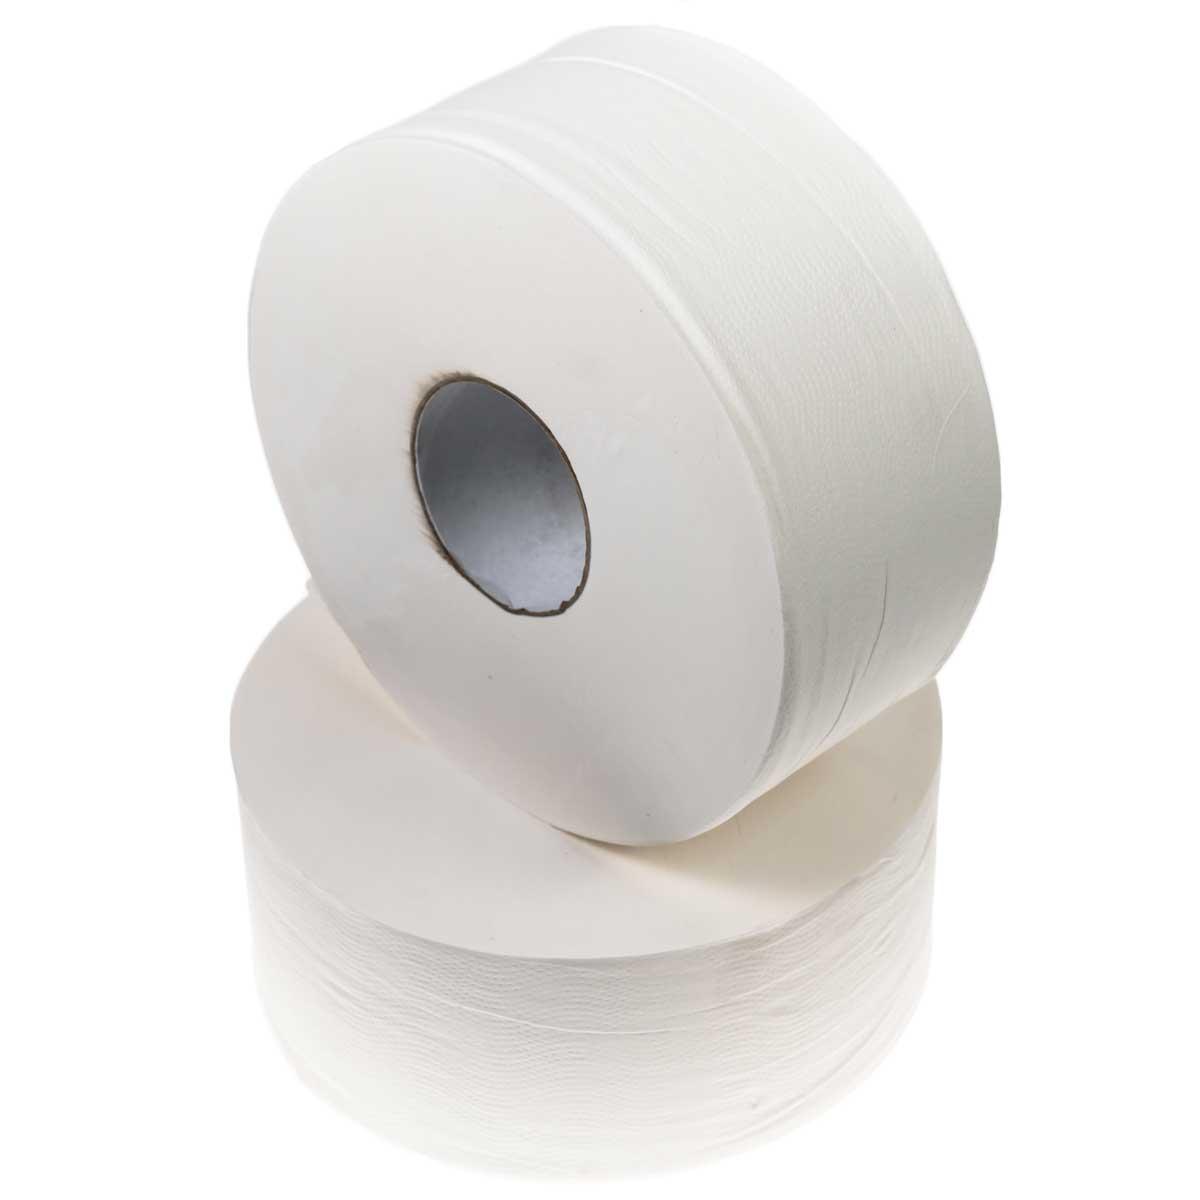 duro jumbo toilet paper roll